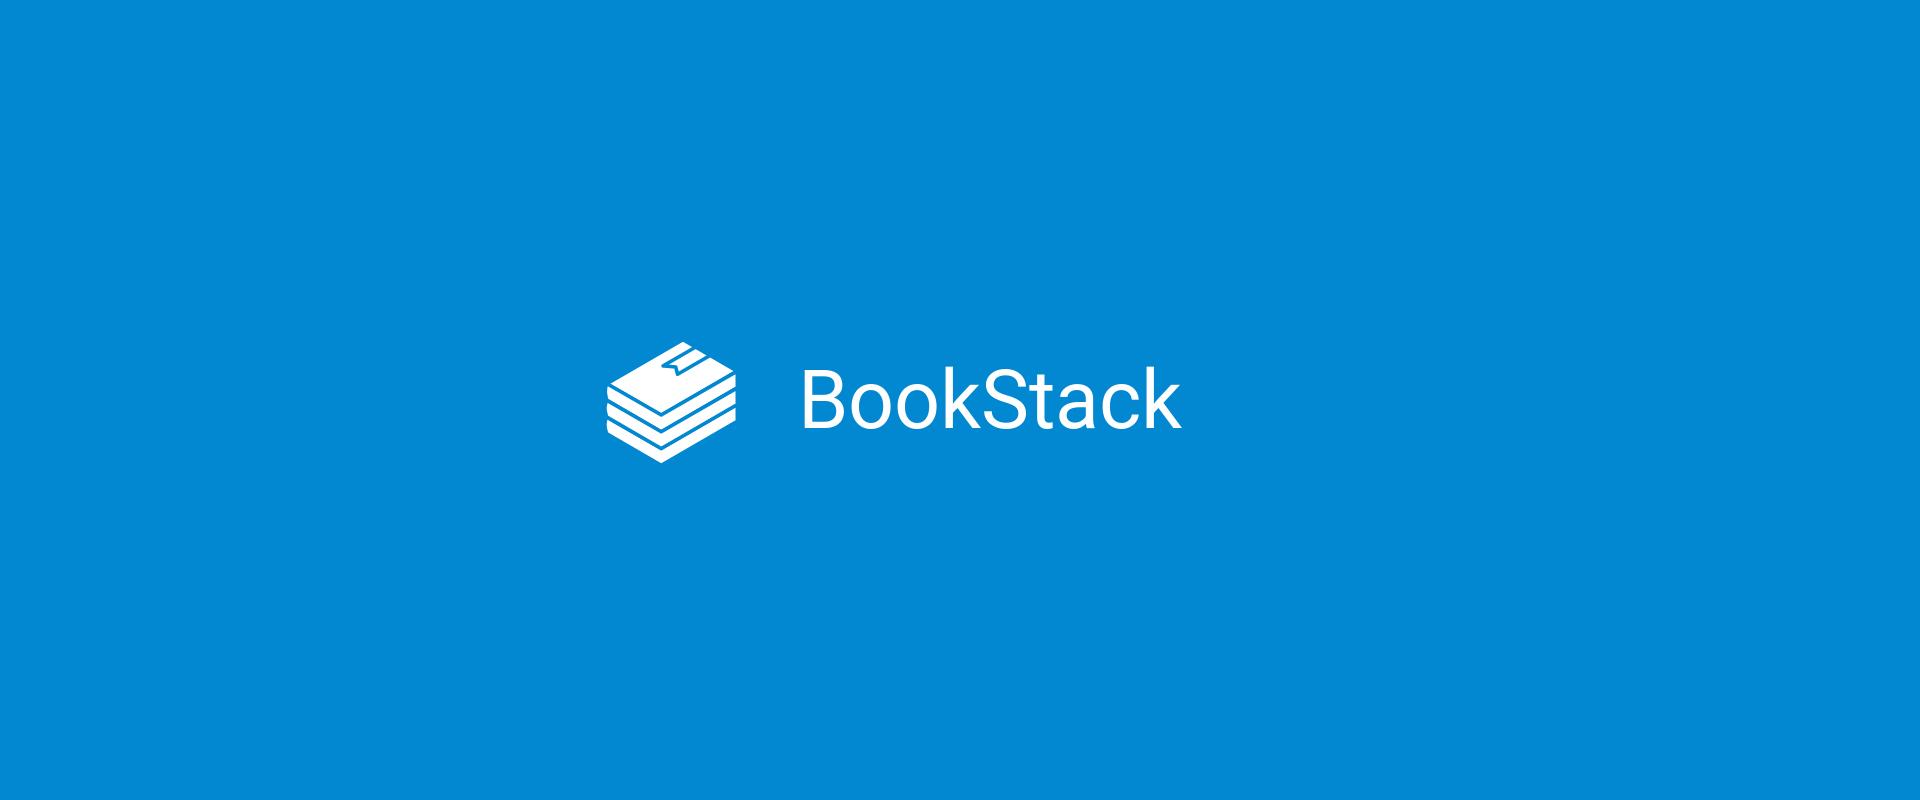 BookStack - Stocker-Organiser des informations sur une plateforme OpenSource